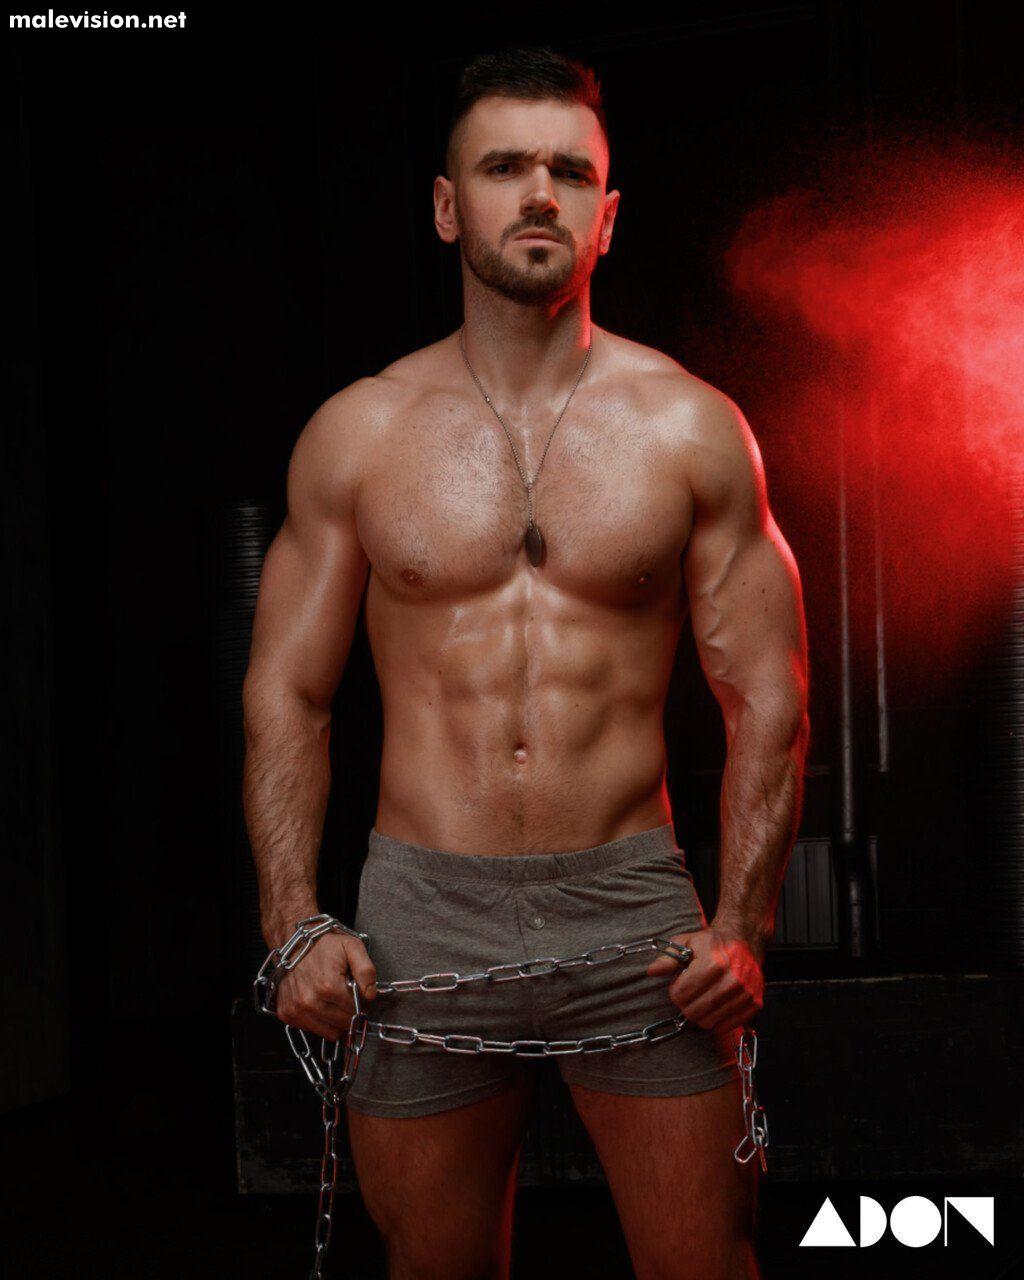 Adrian Rafael - male models galleries